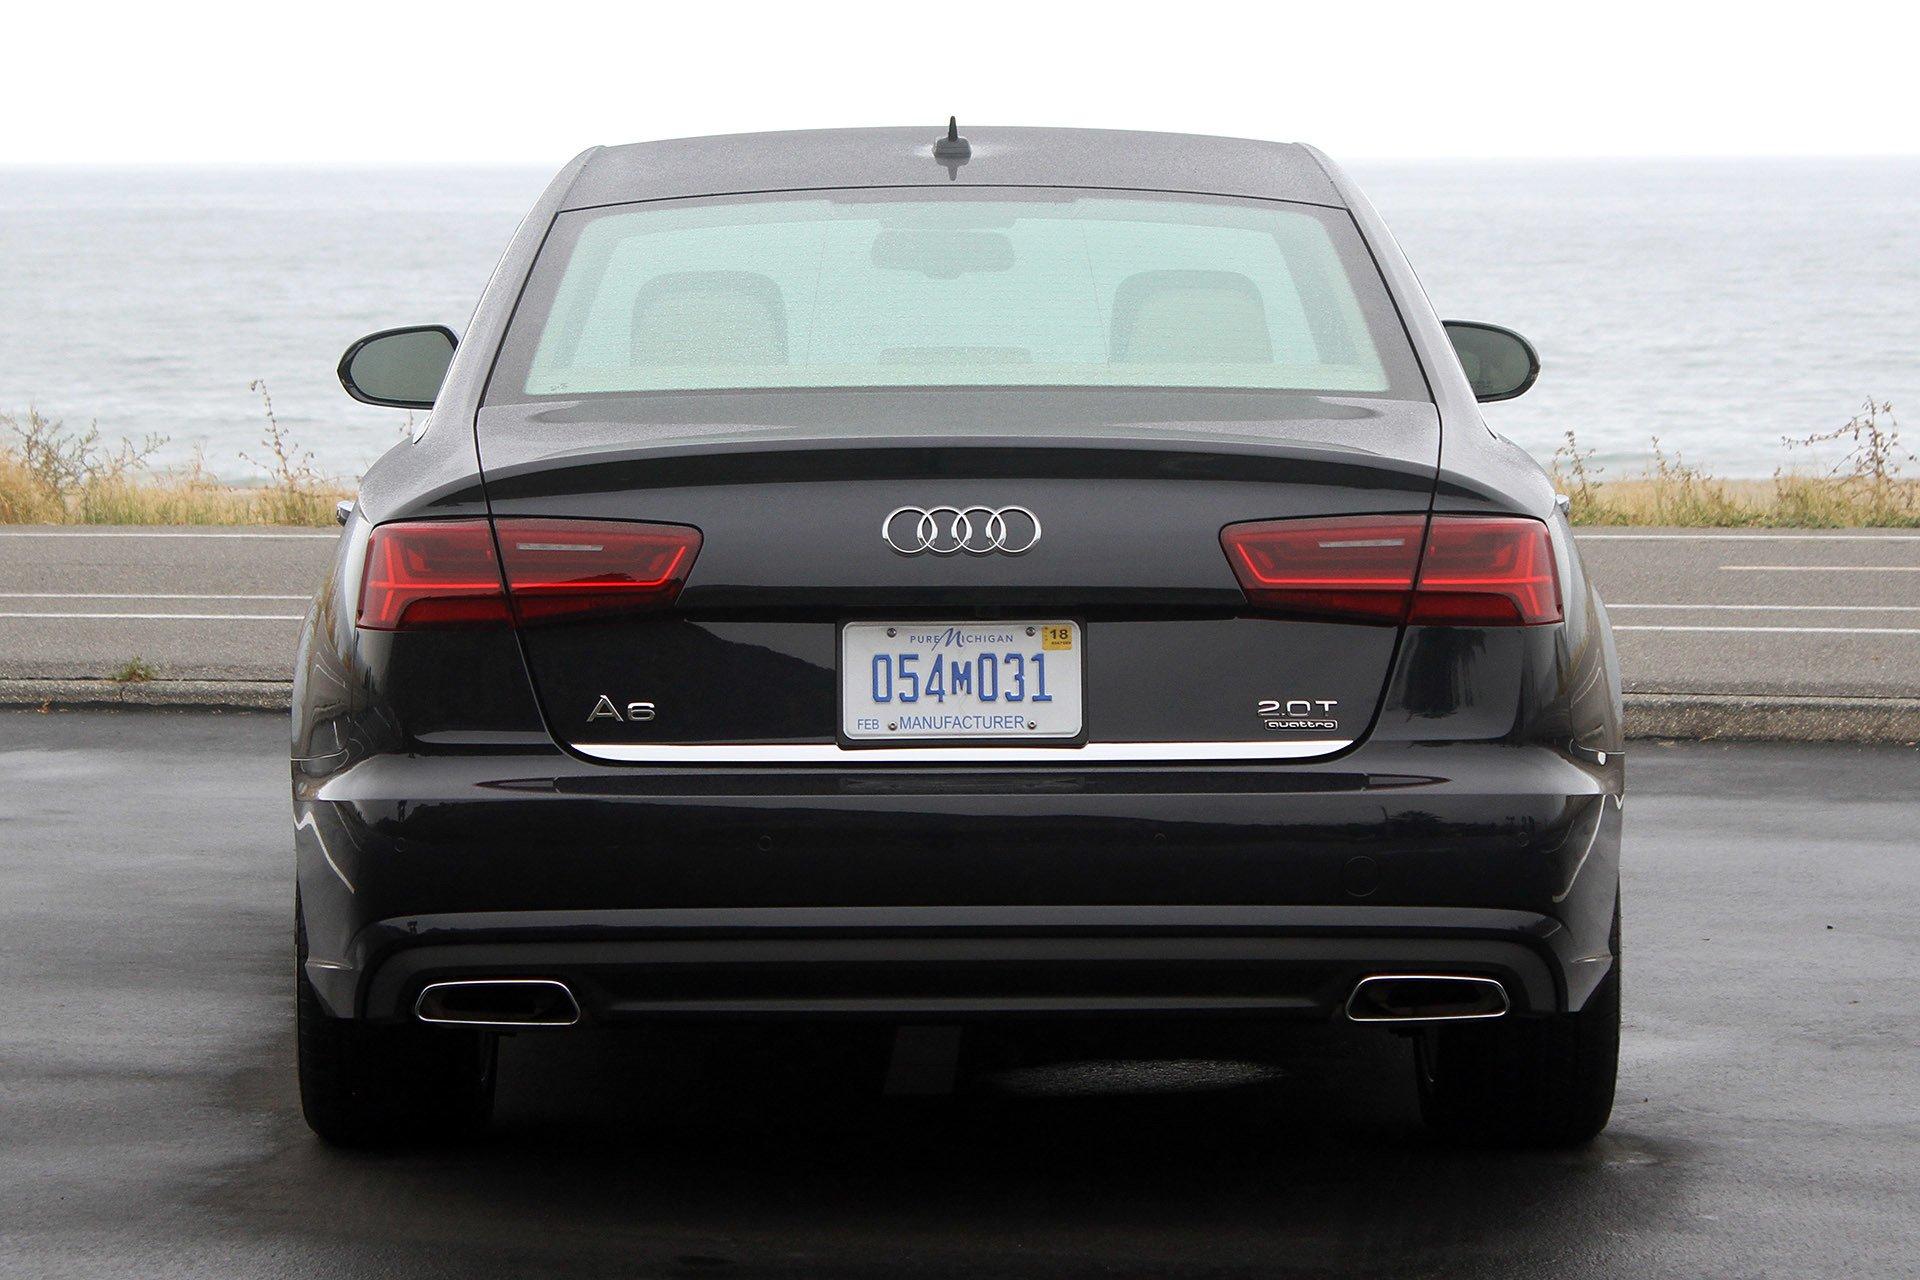 2016 Audi A6 cars sedan black wallpaper | 1920x1280 ...